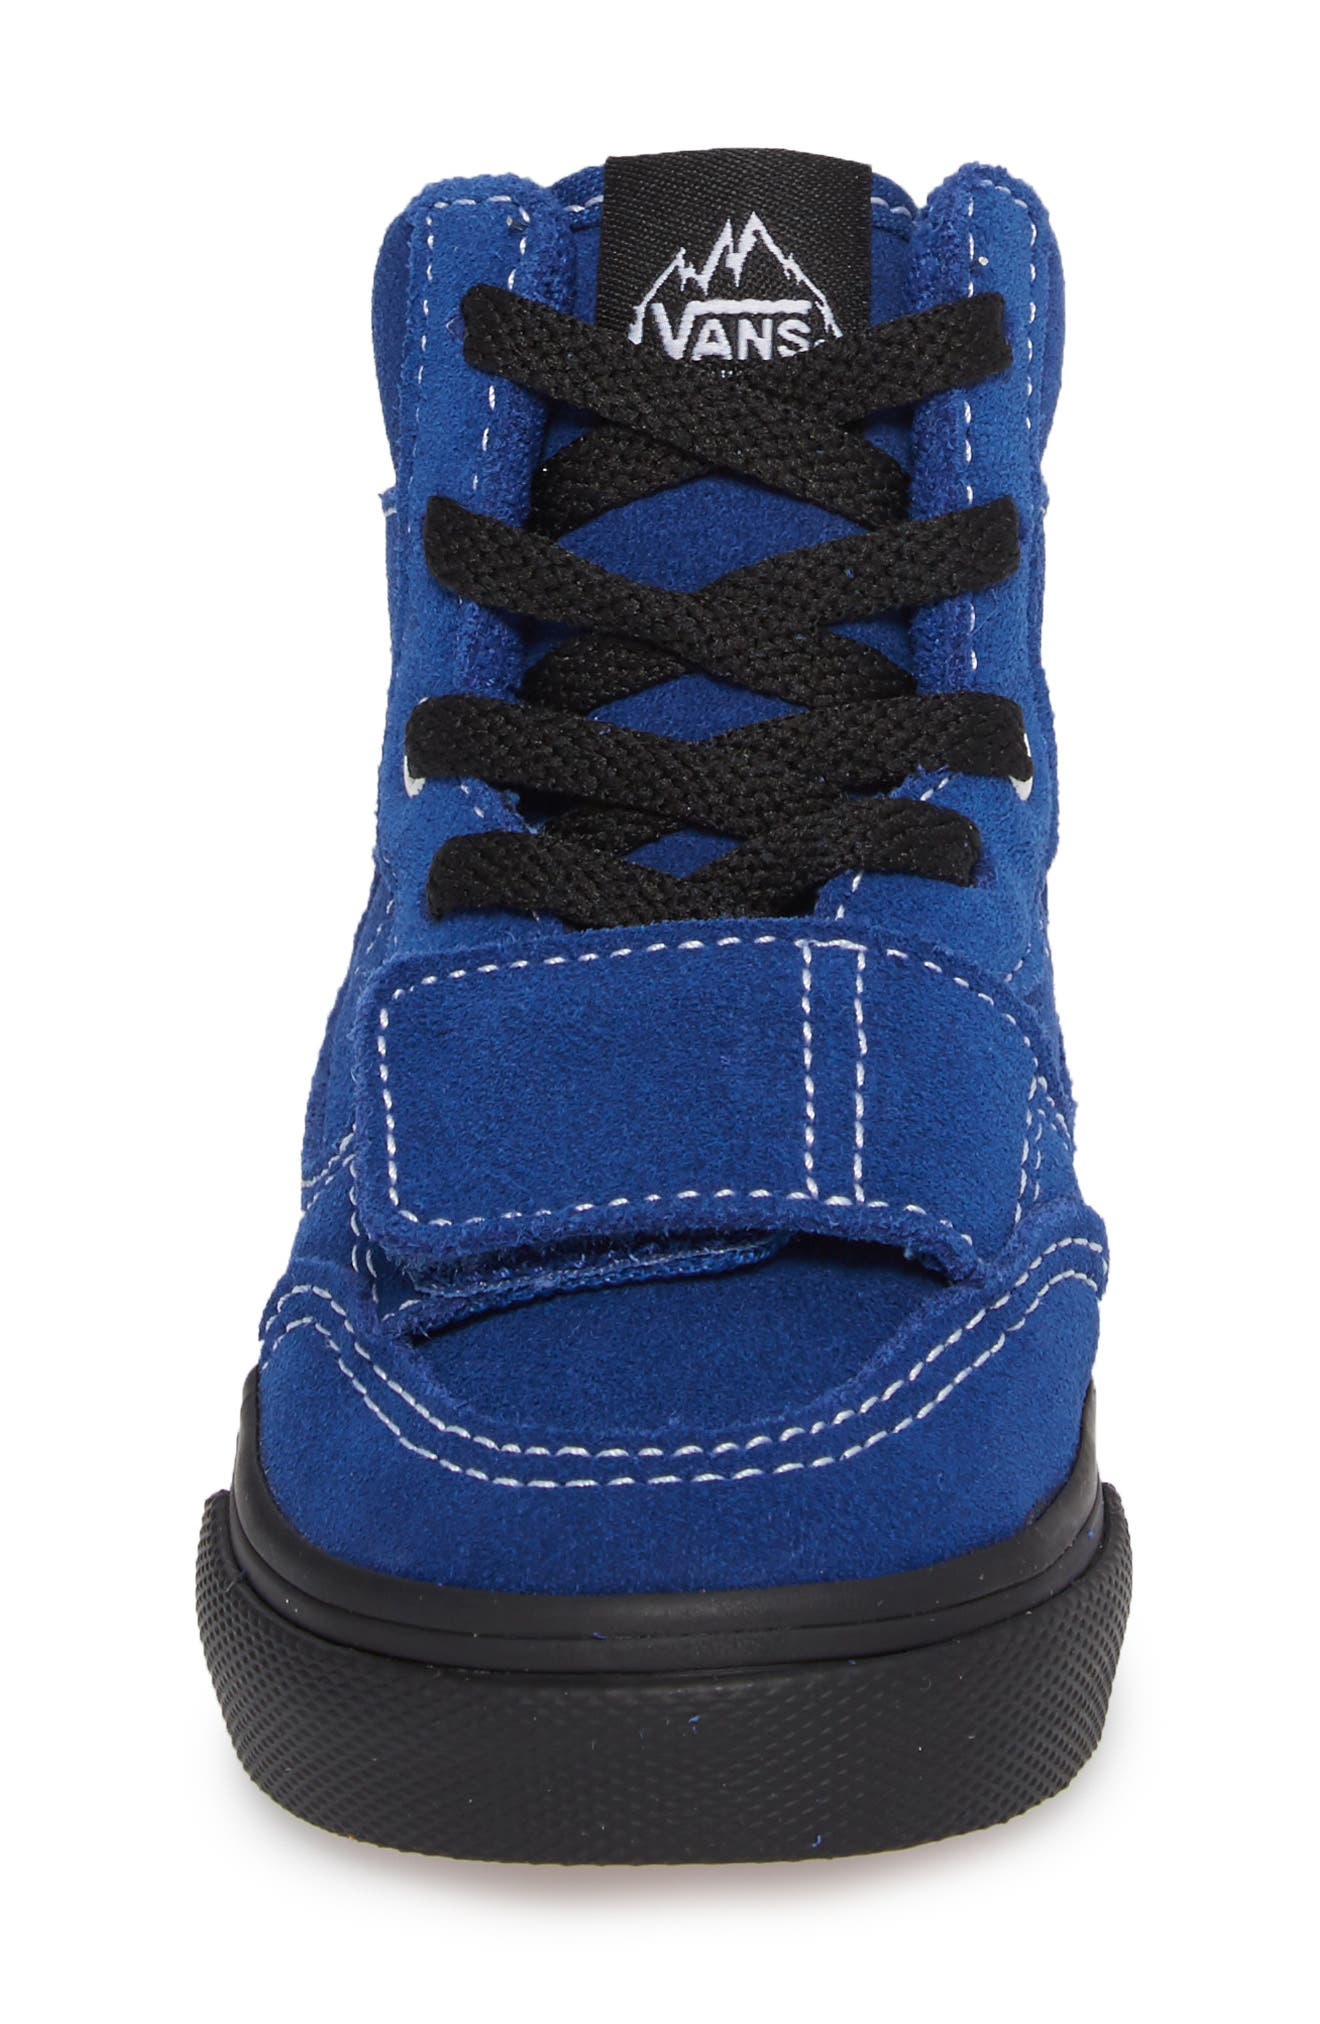 Mountain Edition Mid Top Sneaker,                             Alternate thumbnail 4, color,                             Blue/ Black